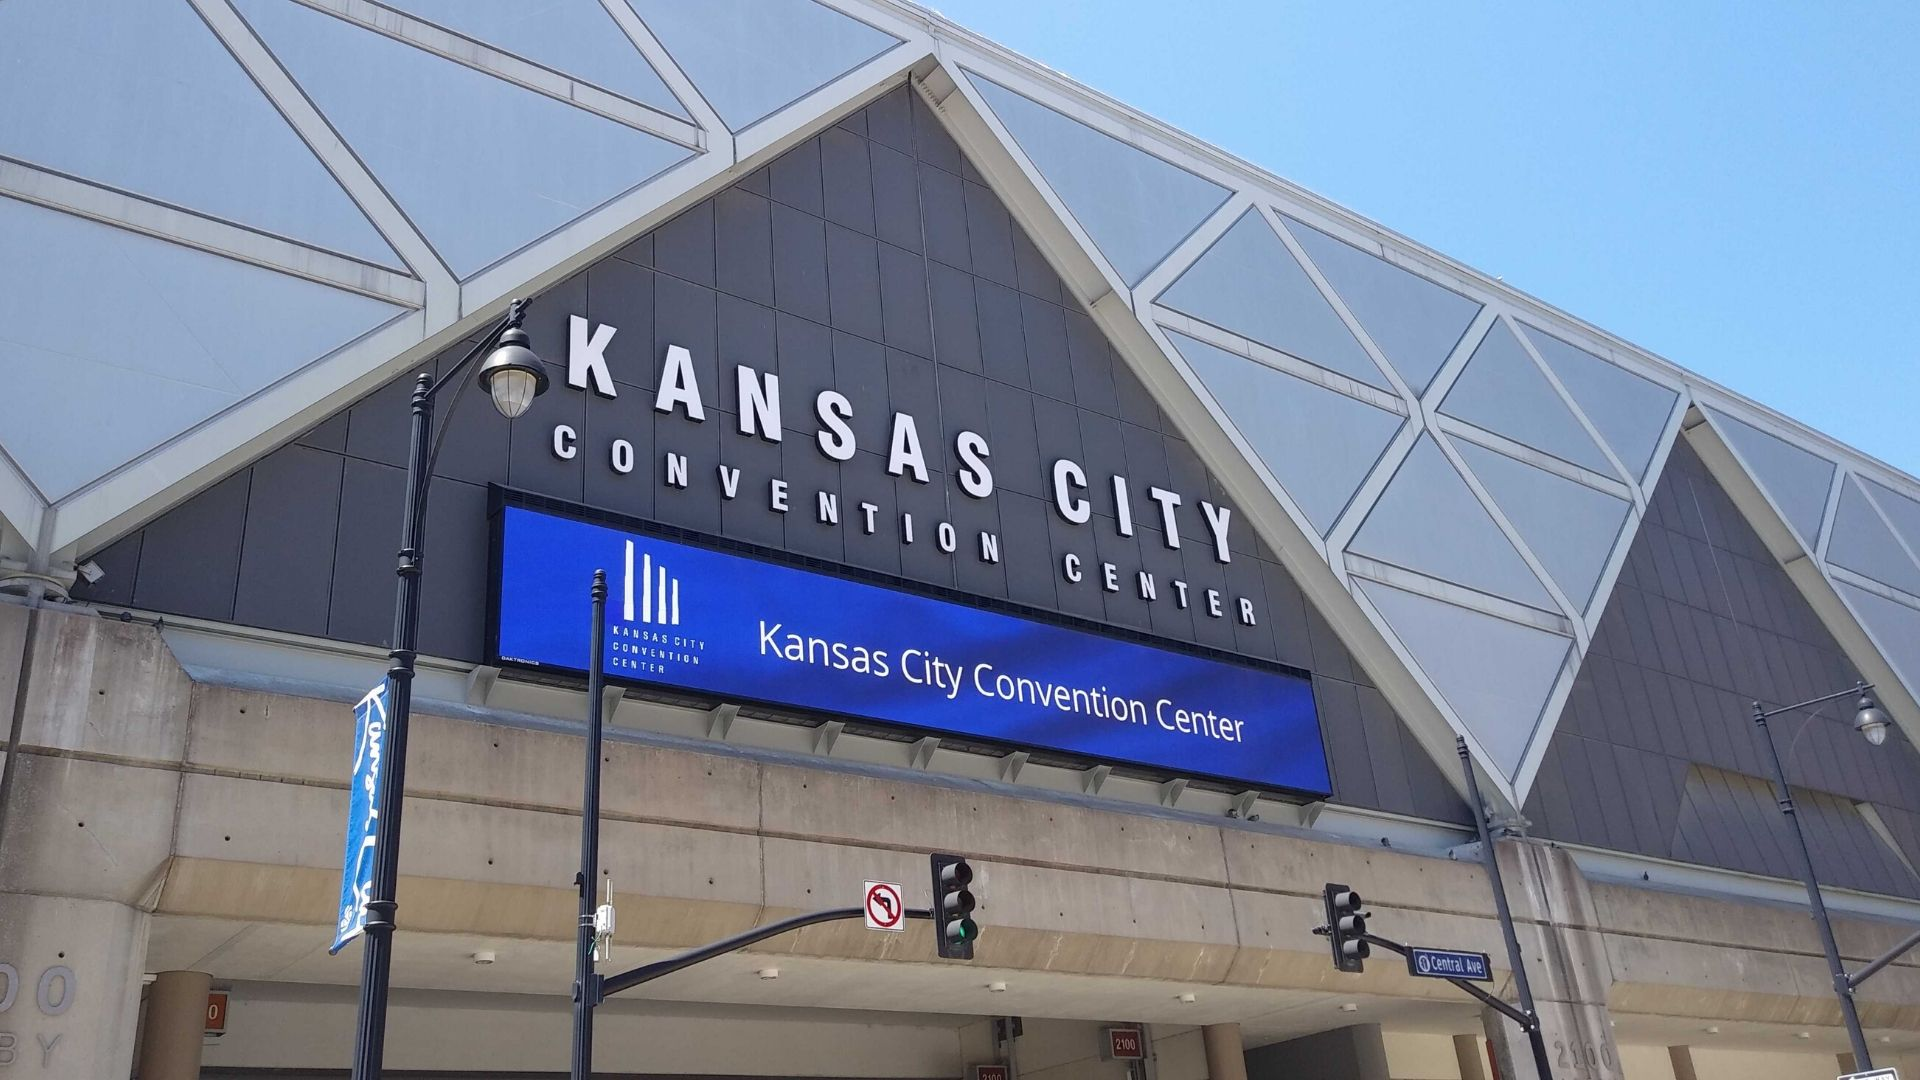 Kansas City Convention Center picture